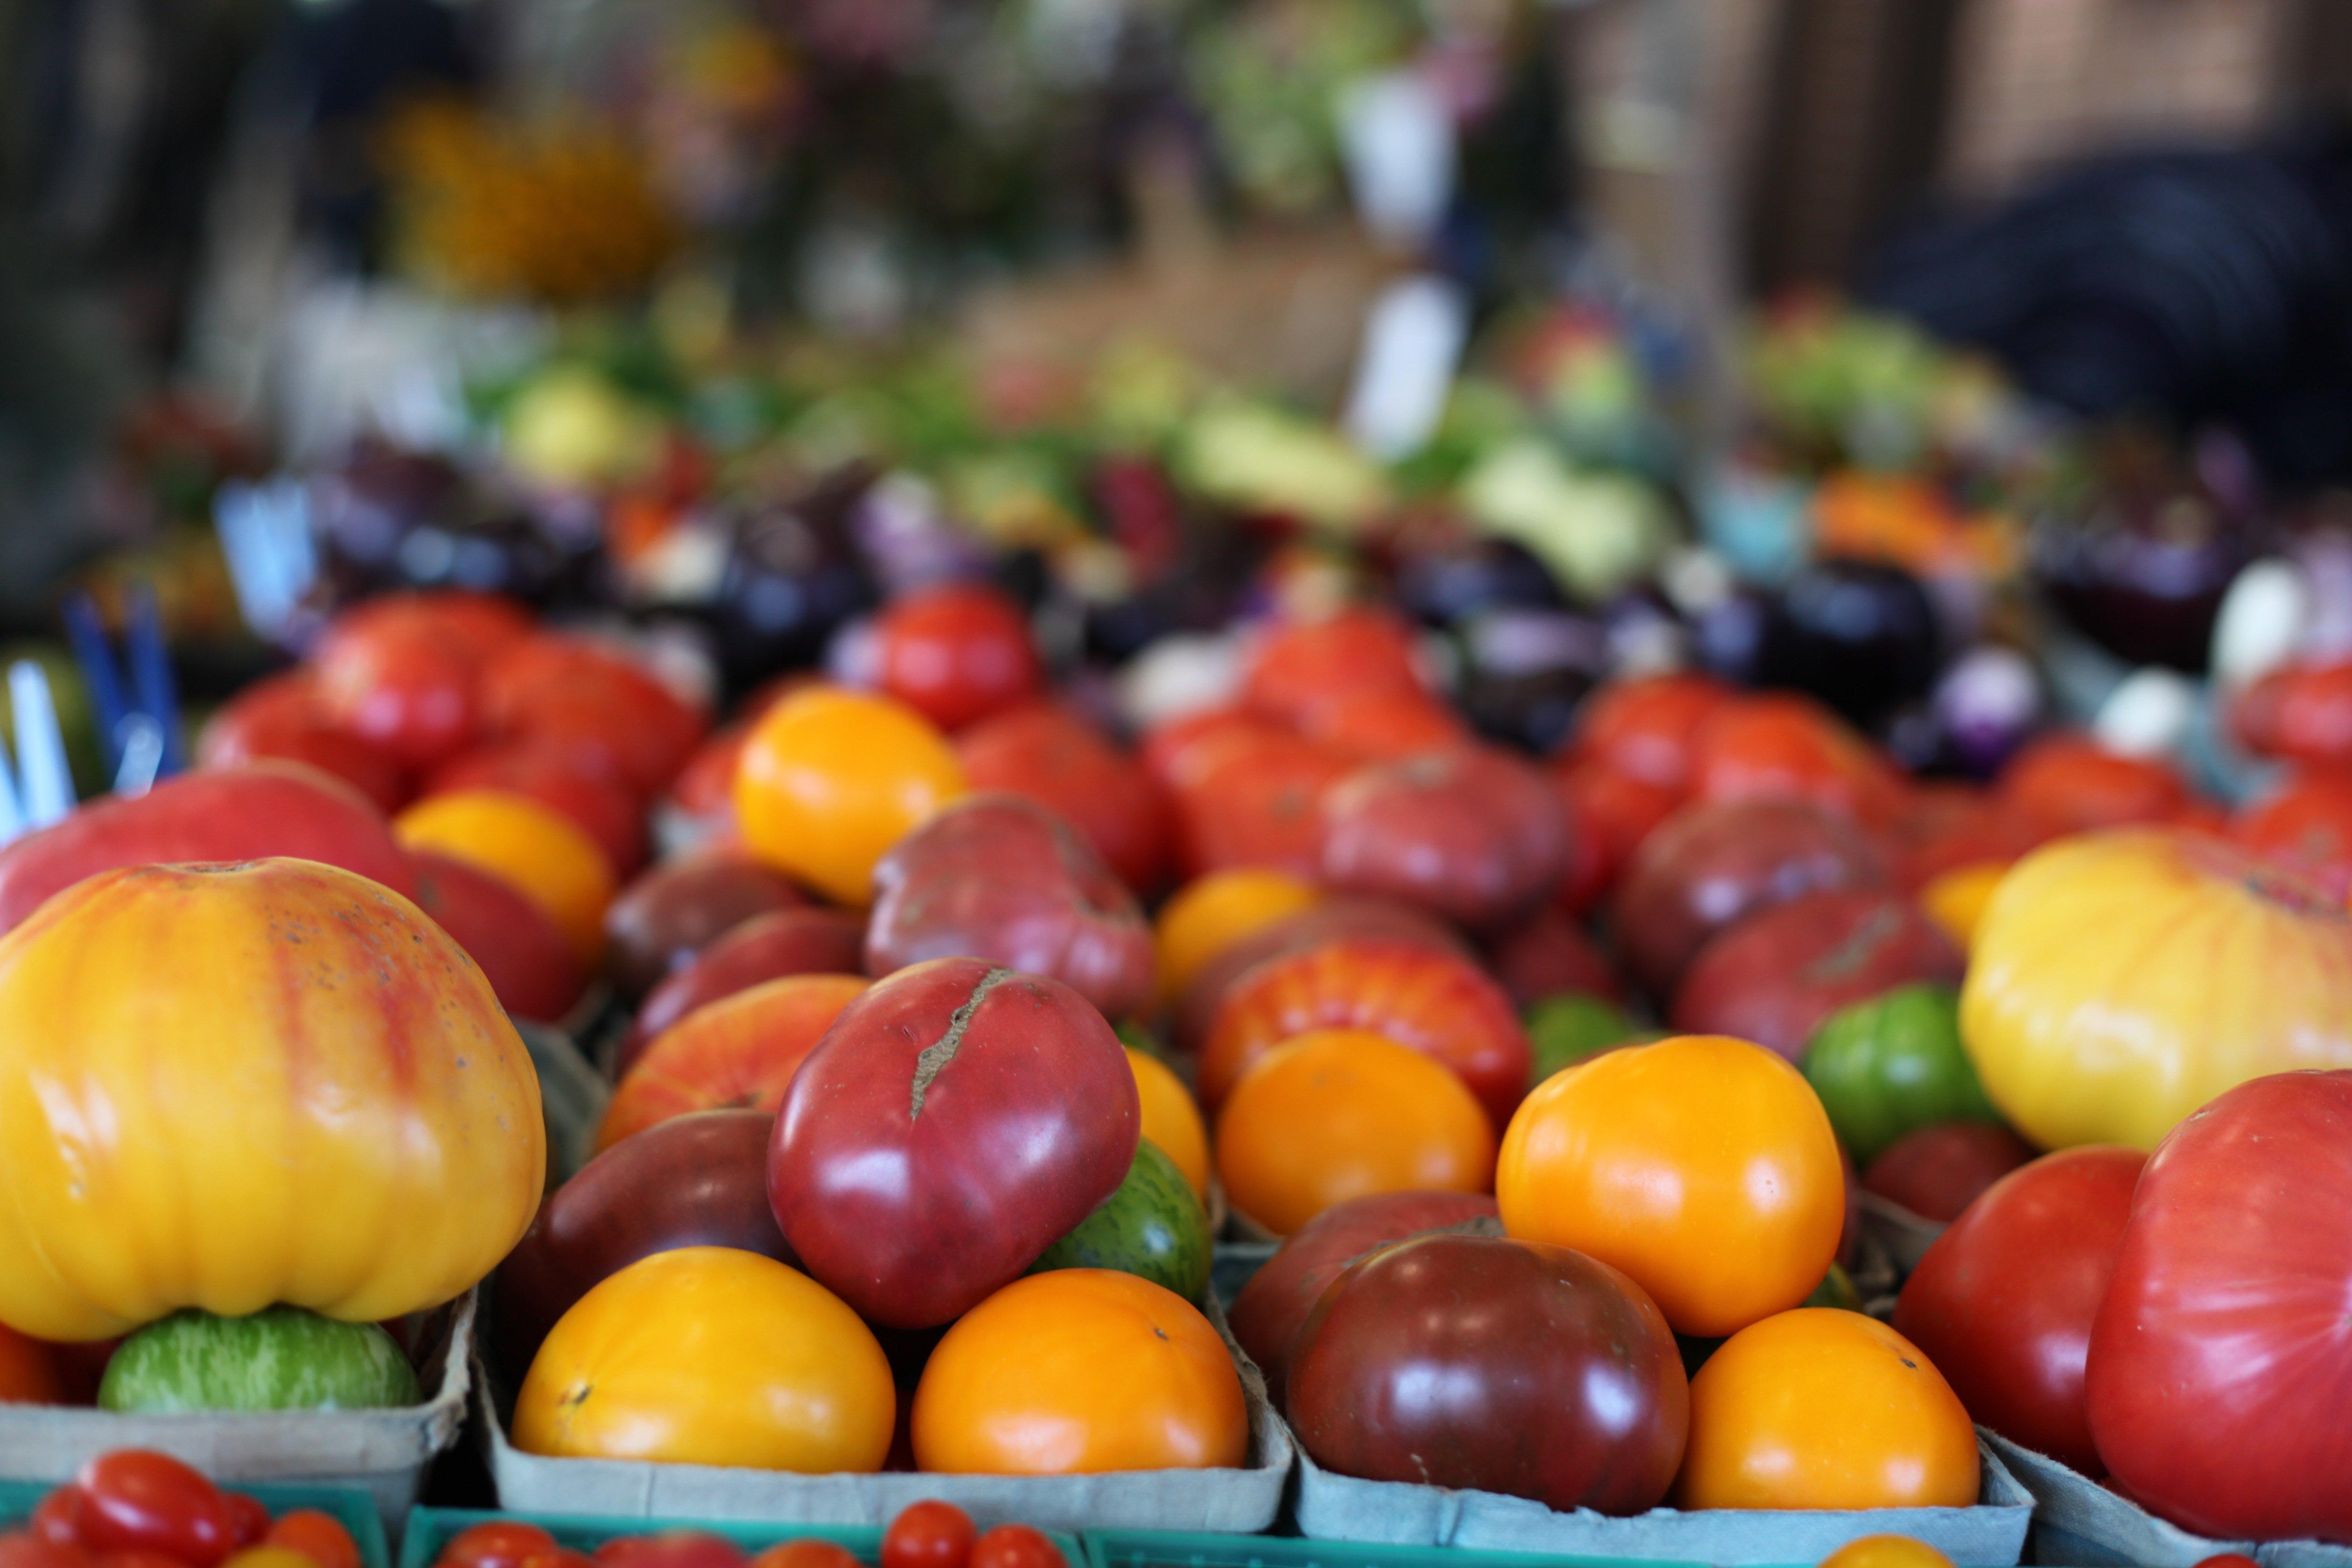 tomatoes w: aperature priority